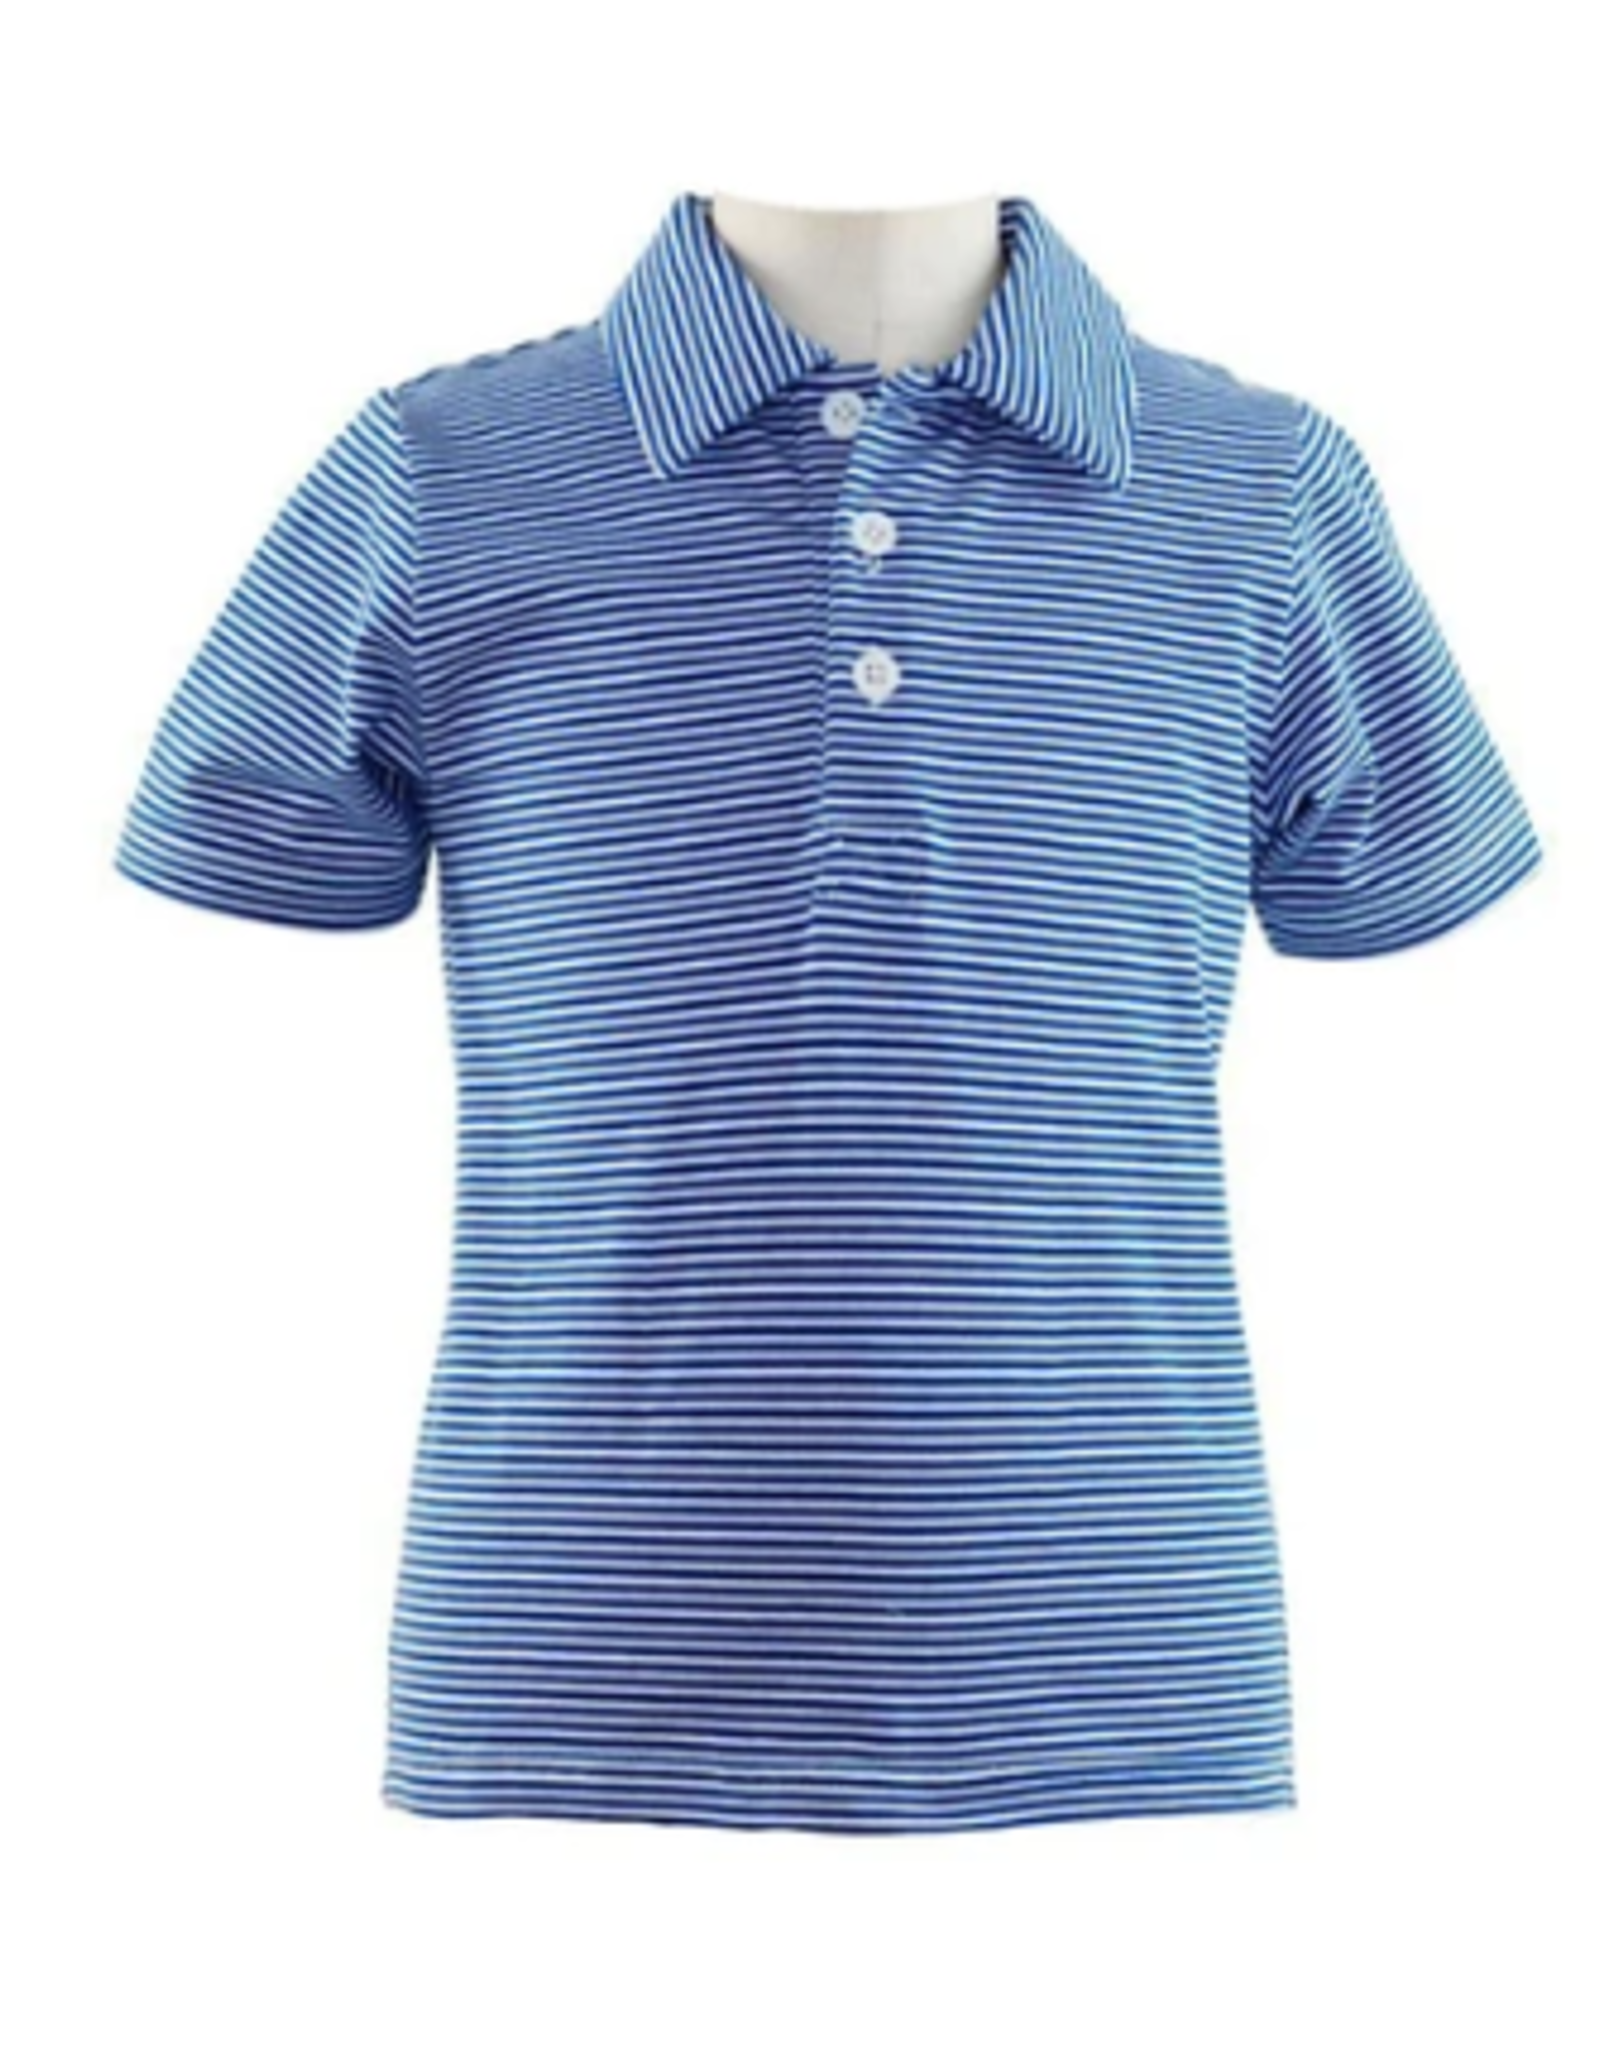 Rachel Riley French Blue Striped Jersey Polo